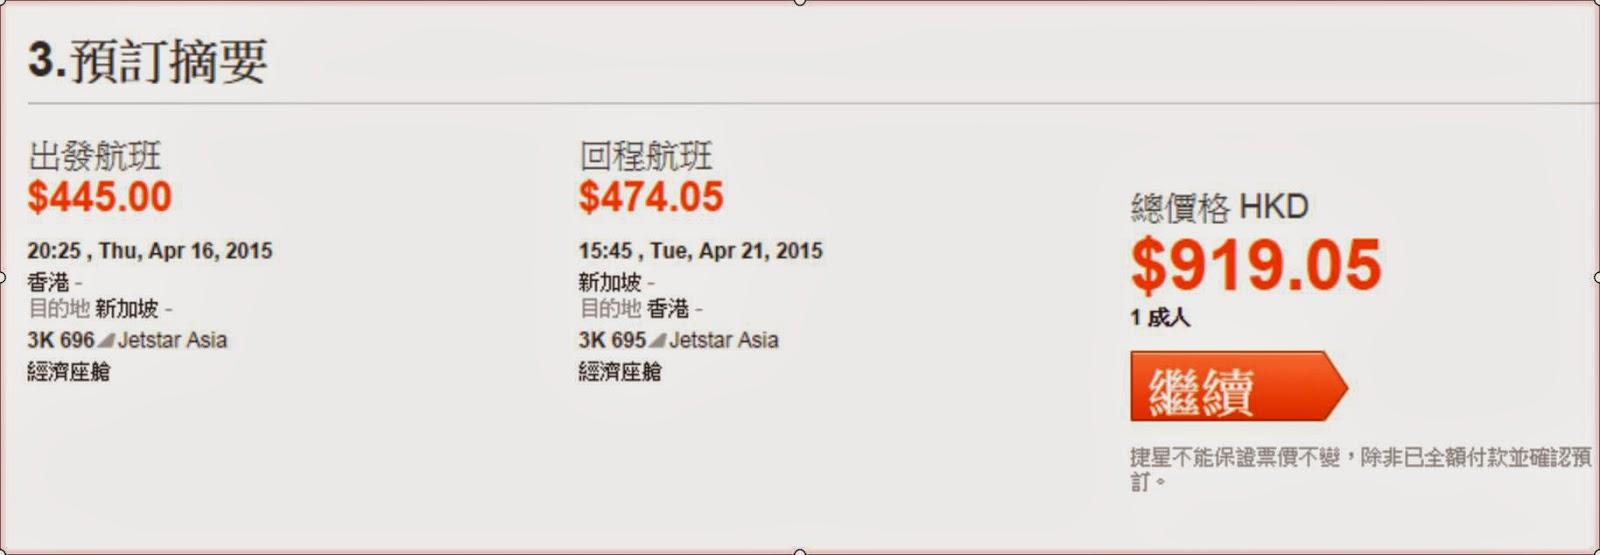 jerstar捷星航空,香港去新加坡 單程HK$266起(來回連稅HK$919起)